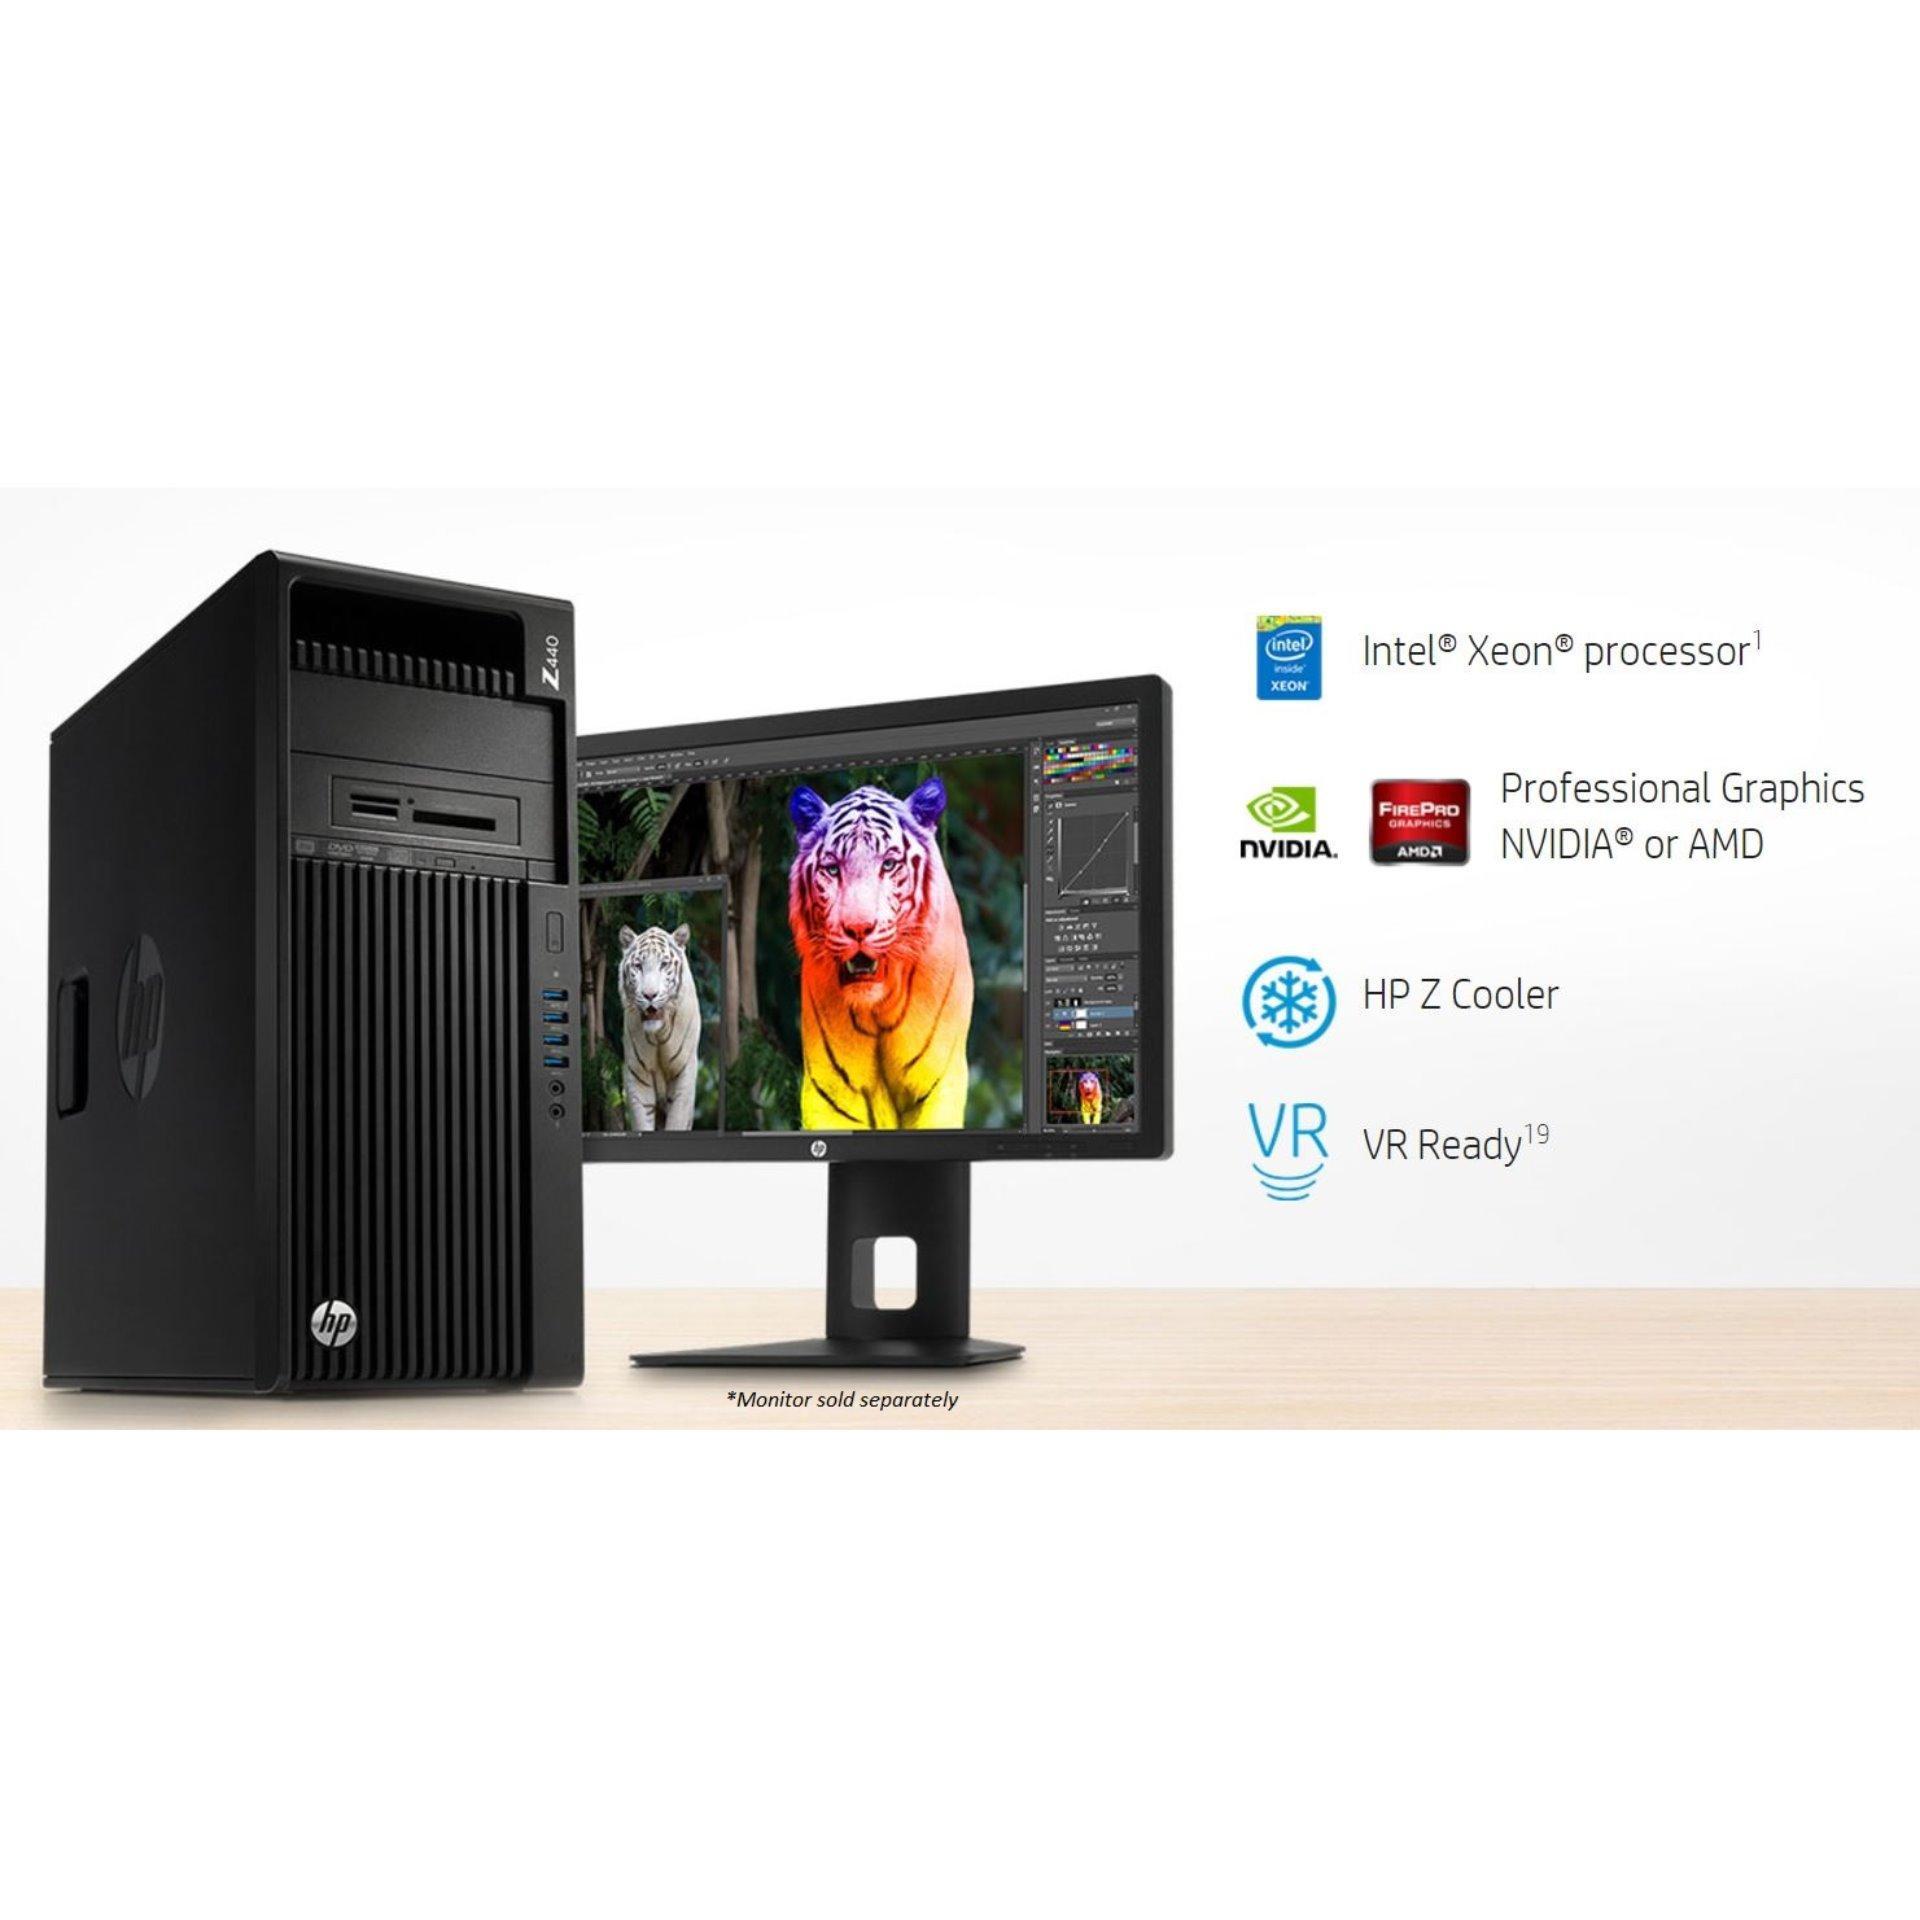 HP Z440 Workstation- Xeon E5-1620v4 3.5, 16GB,WIN10 PRO